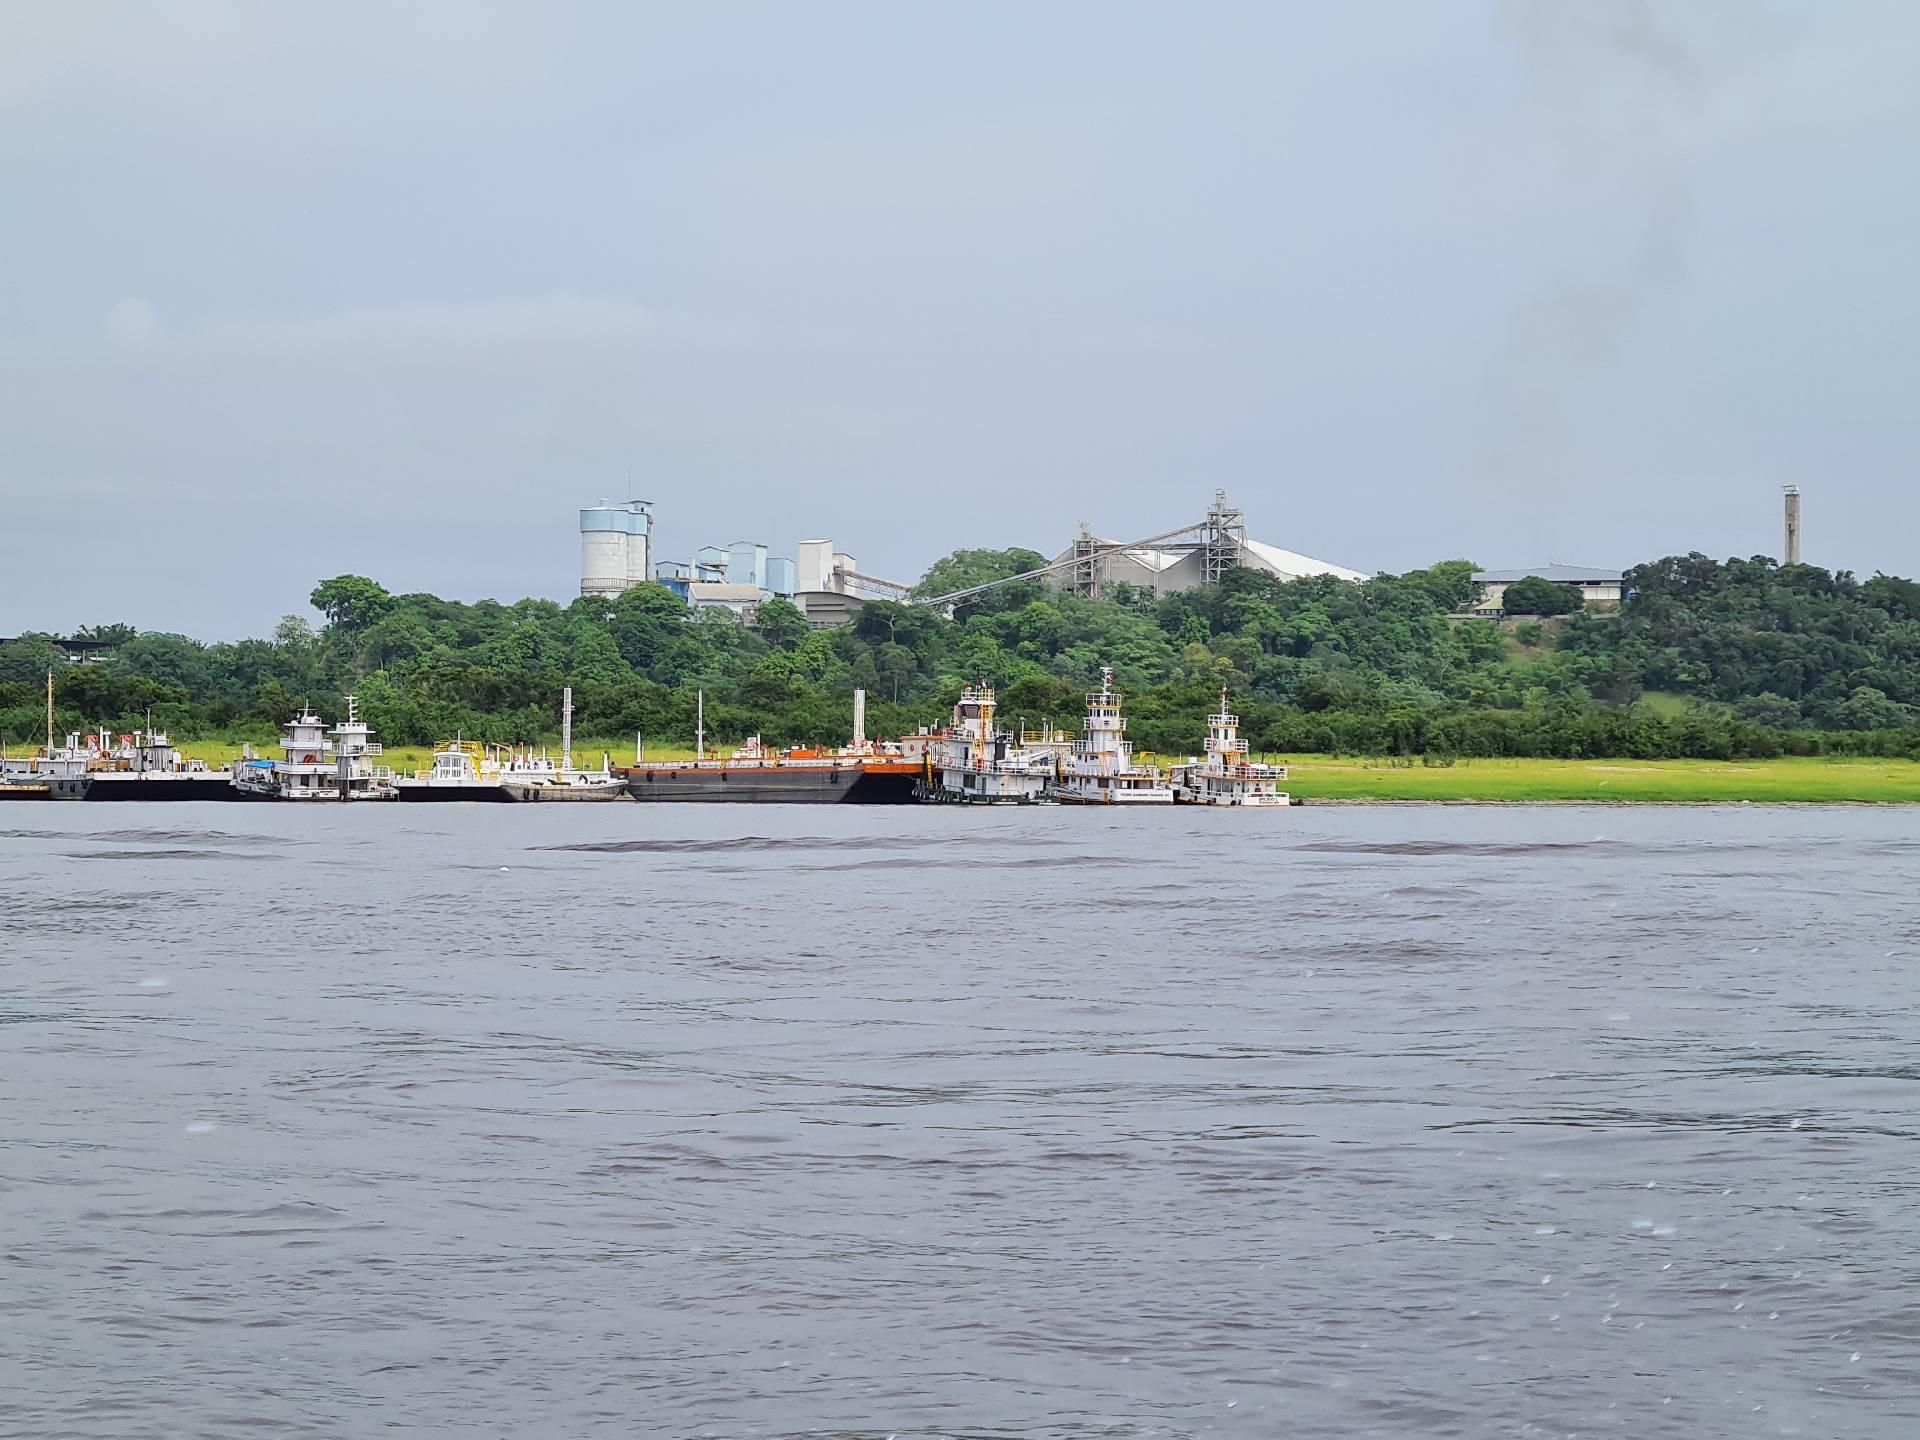 корабли у берега Амазонки, вид с реки